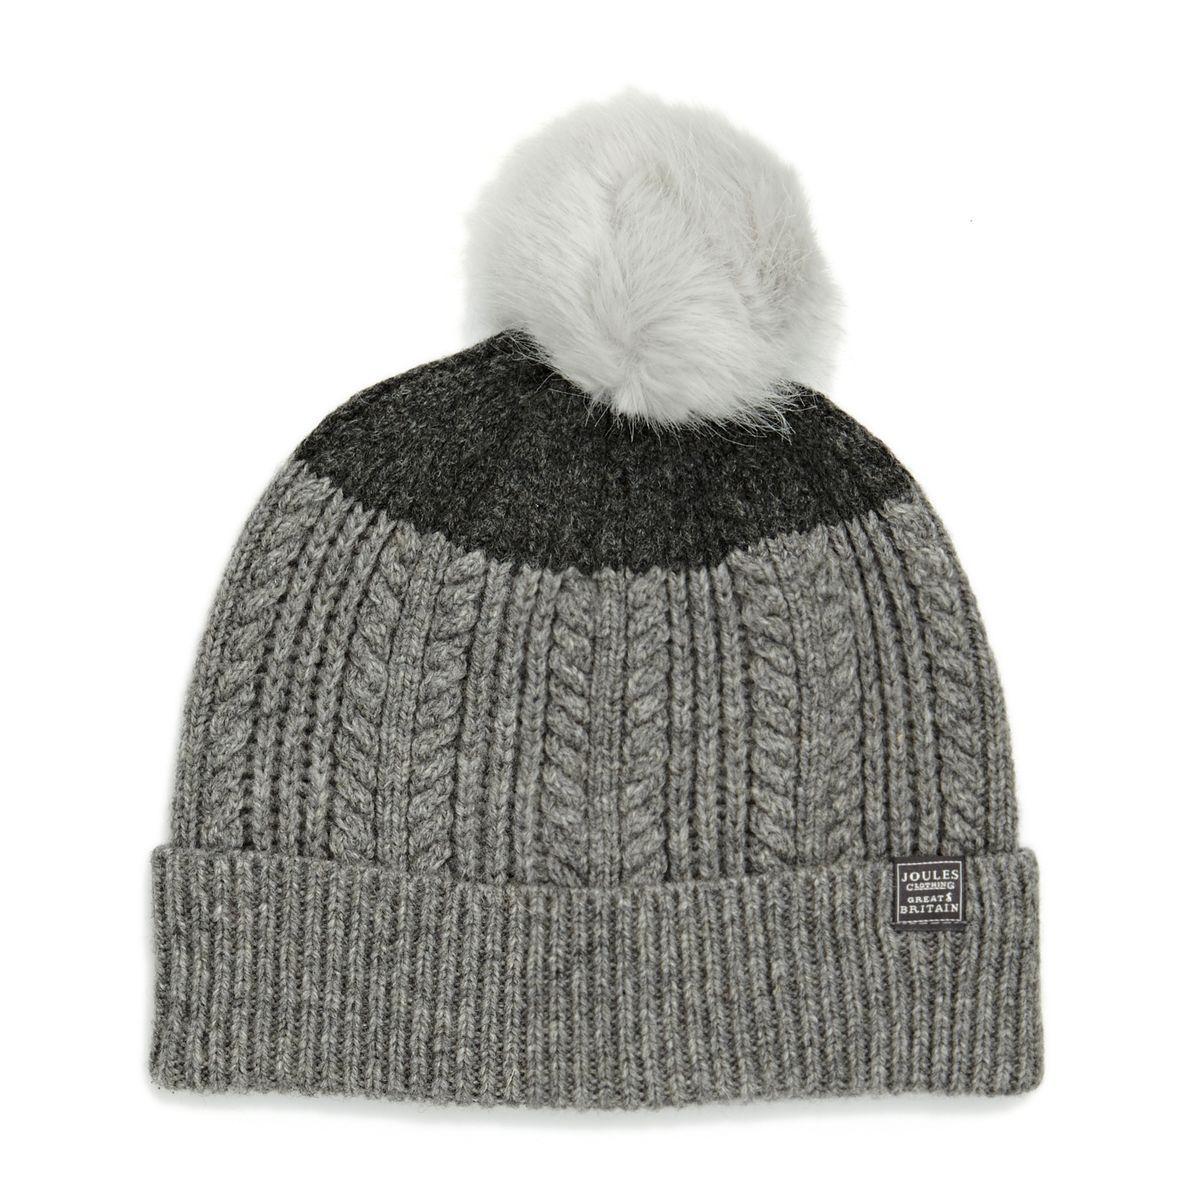 491e7391c0296 Joules Beanies - Joules Bobble Hat - Grey Marl